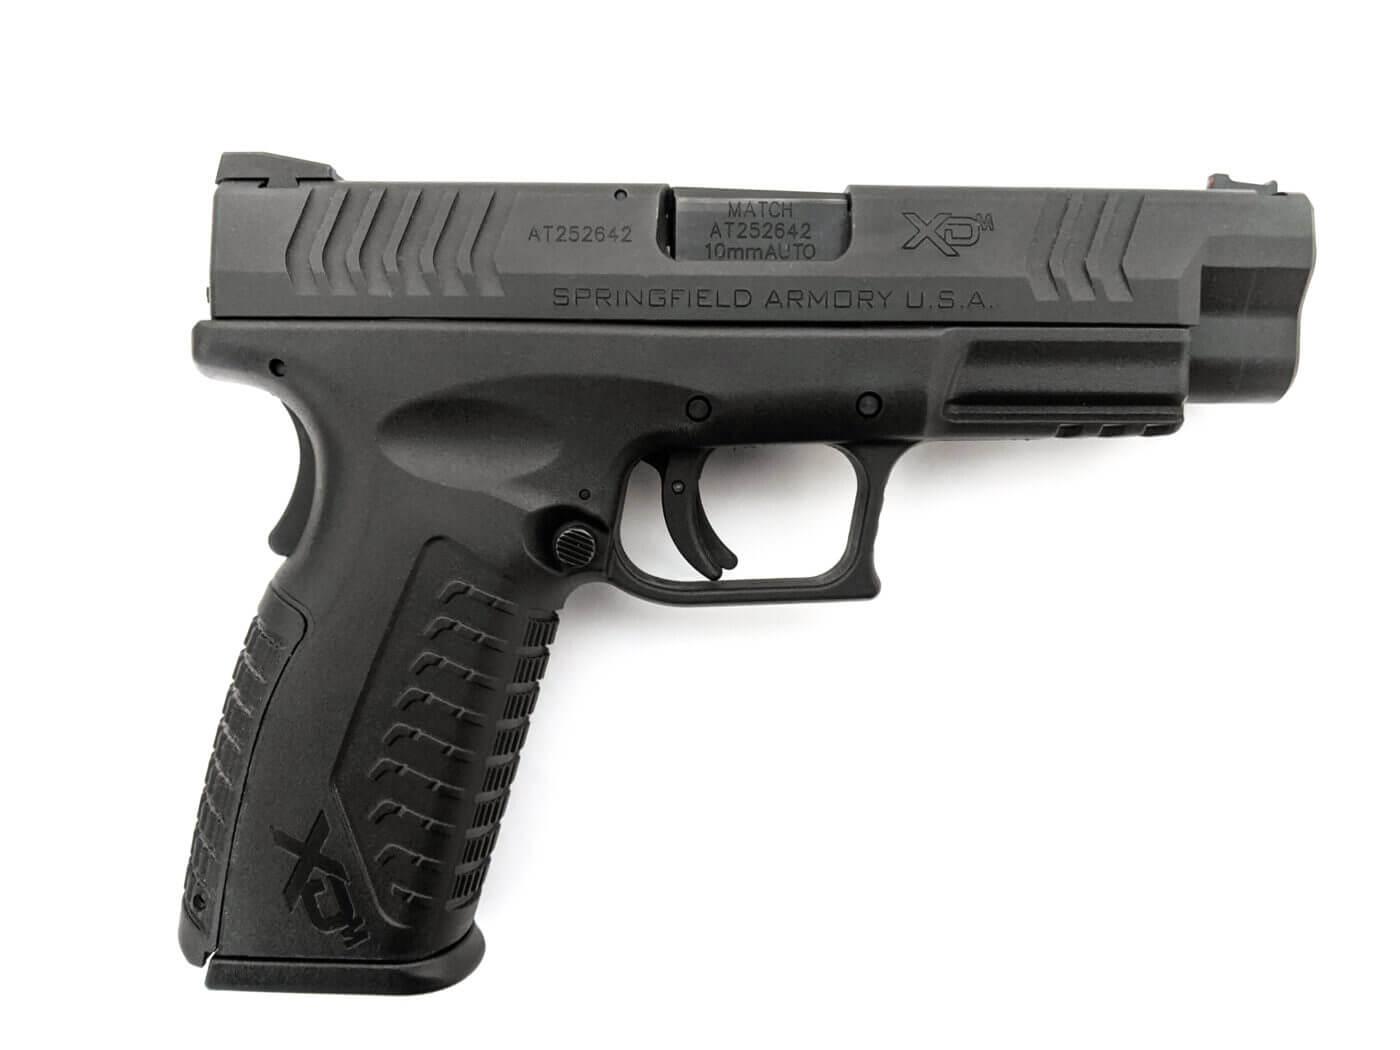 Springfield Armory XD-M pistol in 10mm